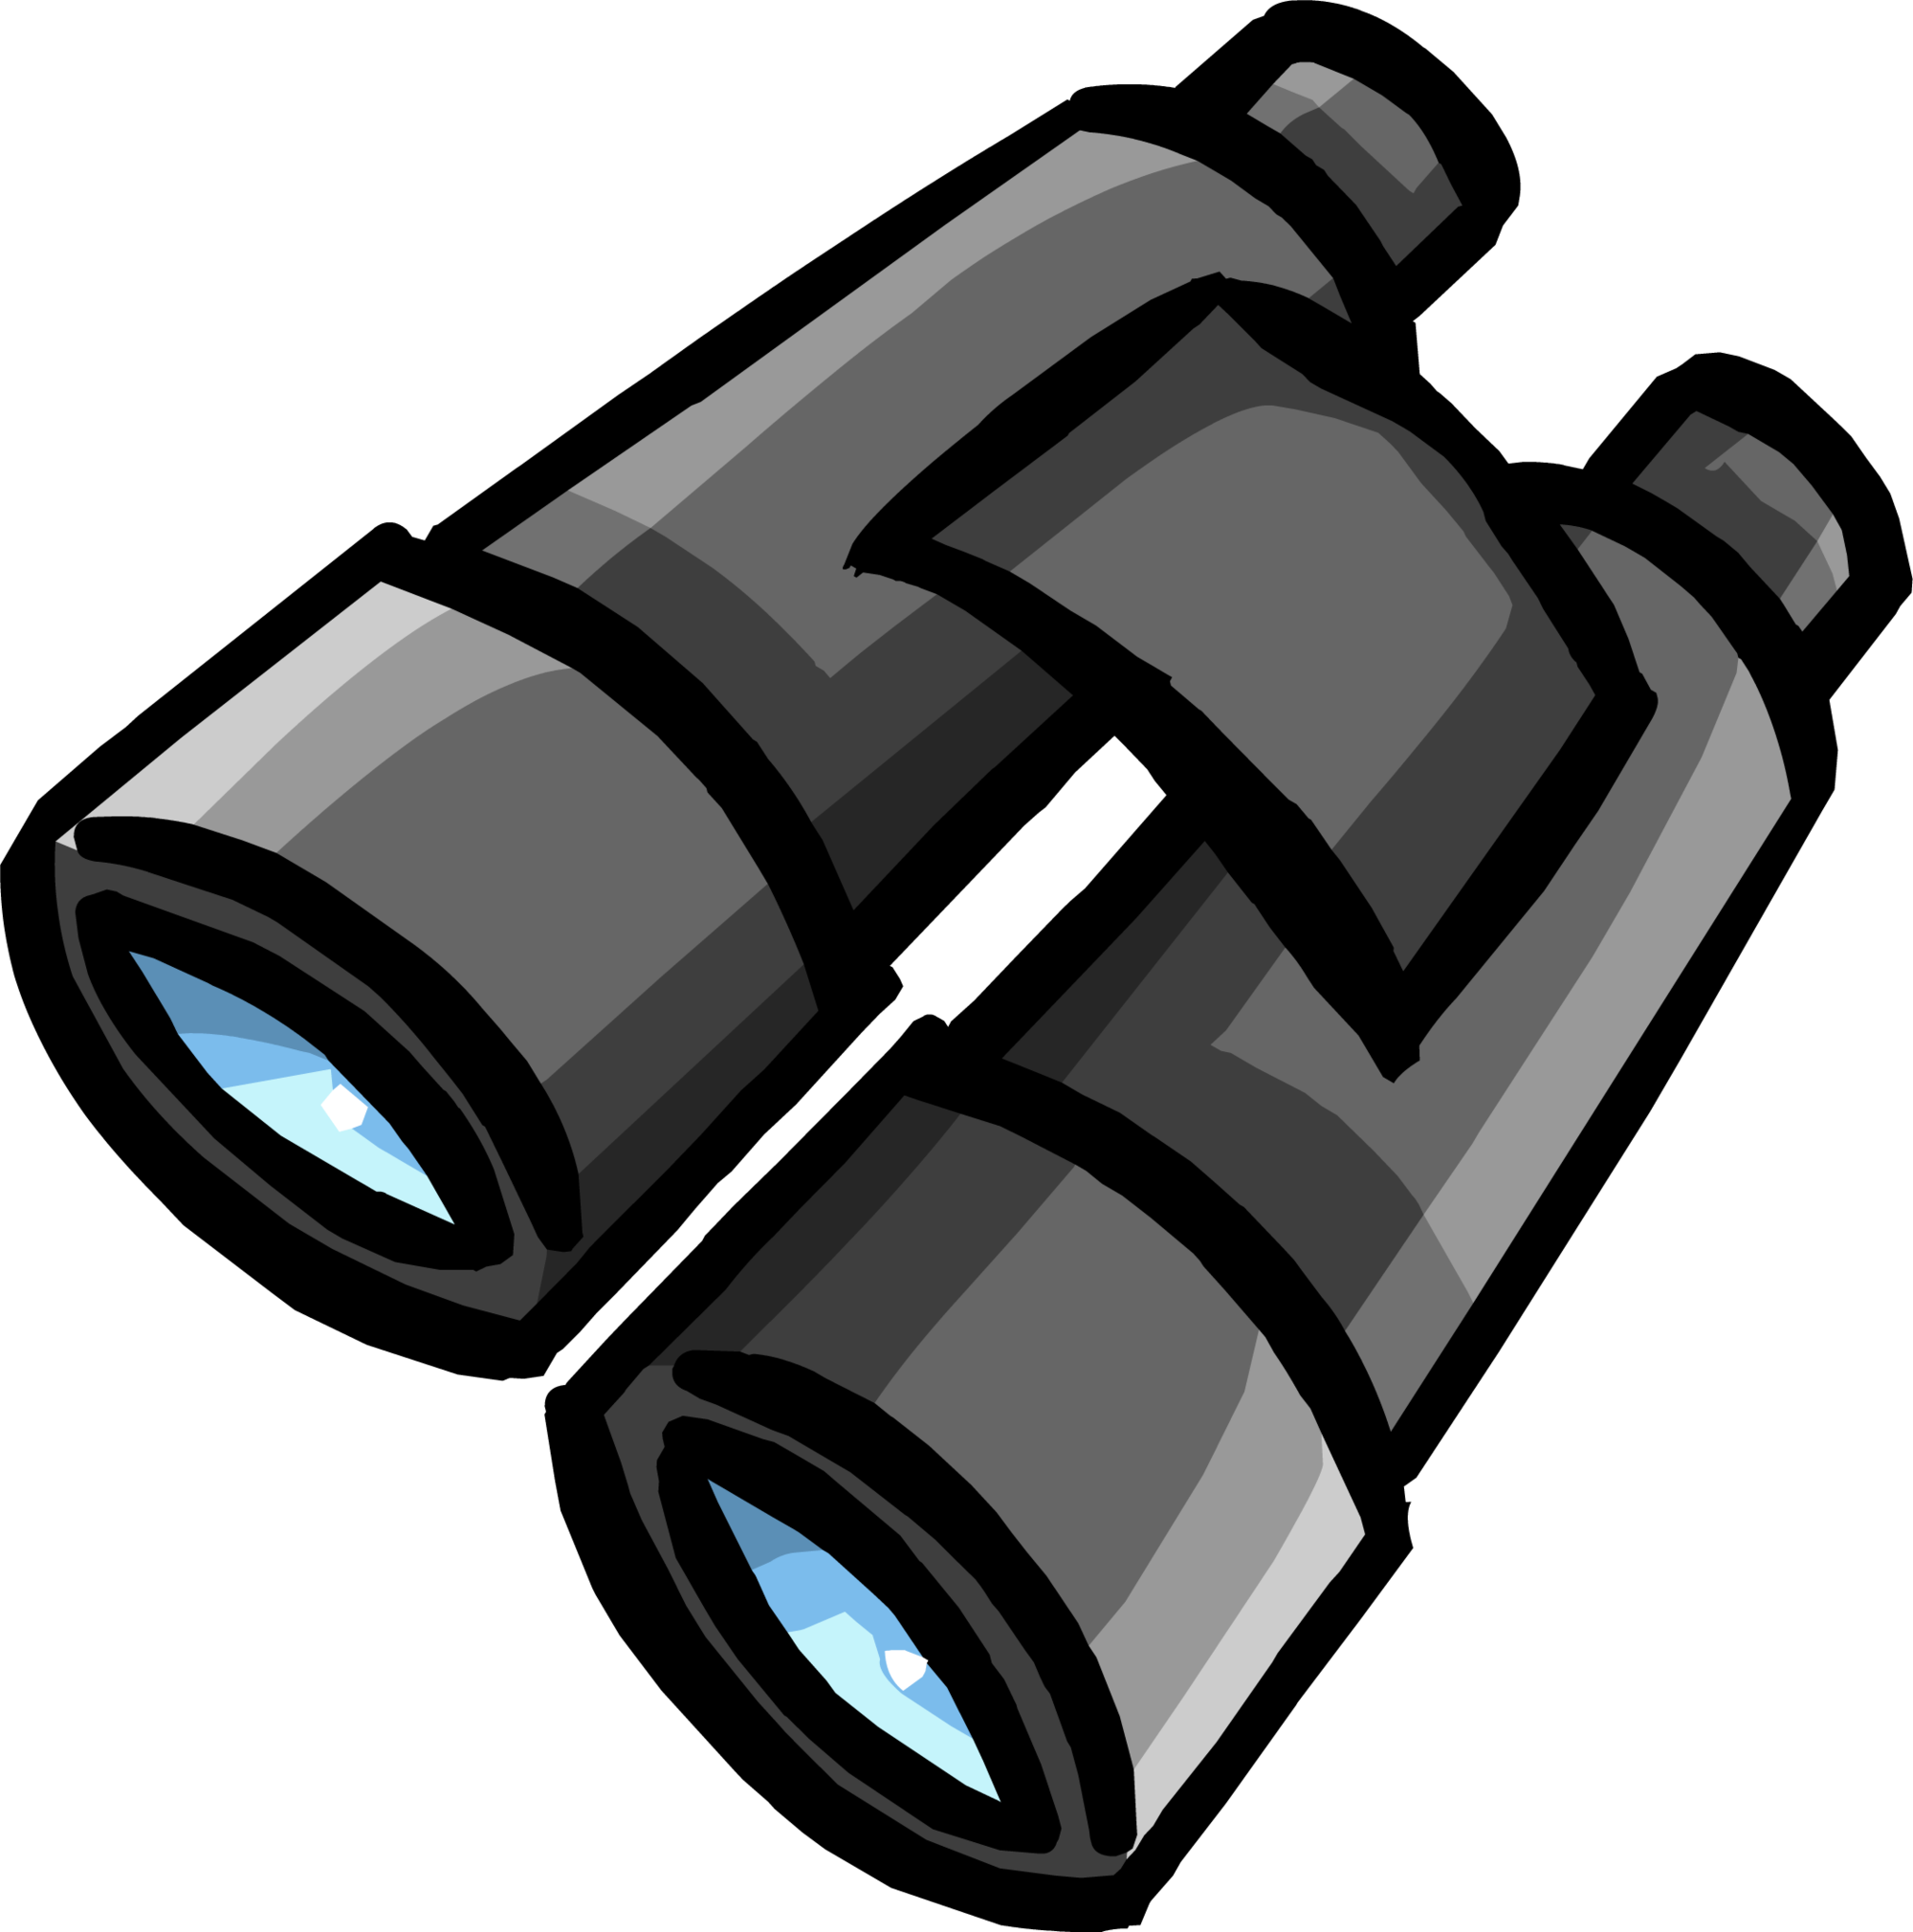 clipart transparent library Image binoculars png club. Binocular clipart.